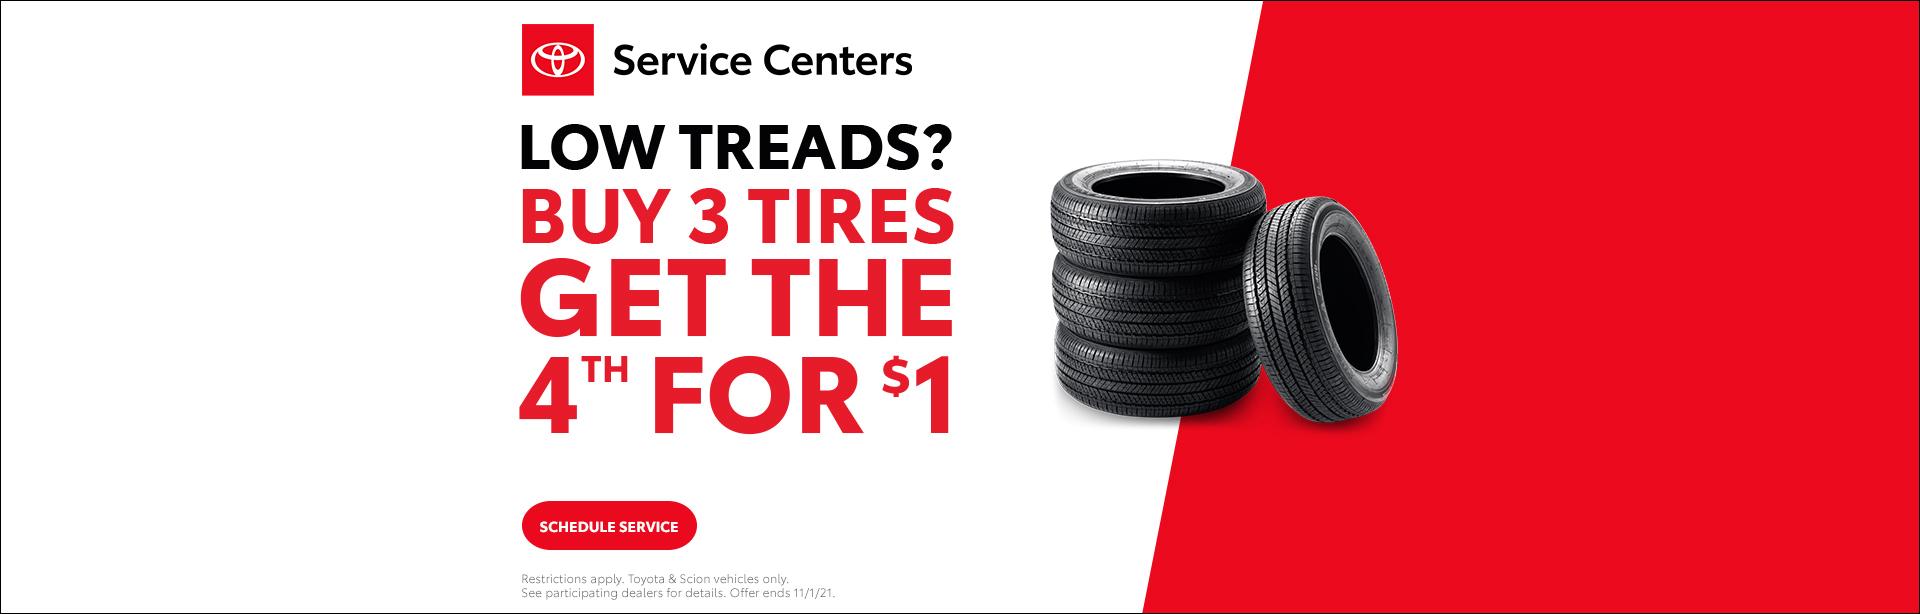 10-21_01_Boston-September-2021-NAT-Buy-3-Tires---BOS_1920x614_f6d1_All-Models_R_xta.jpeg